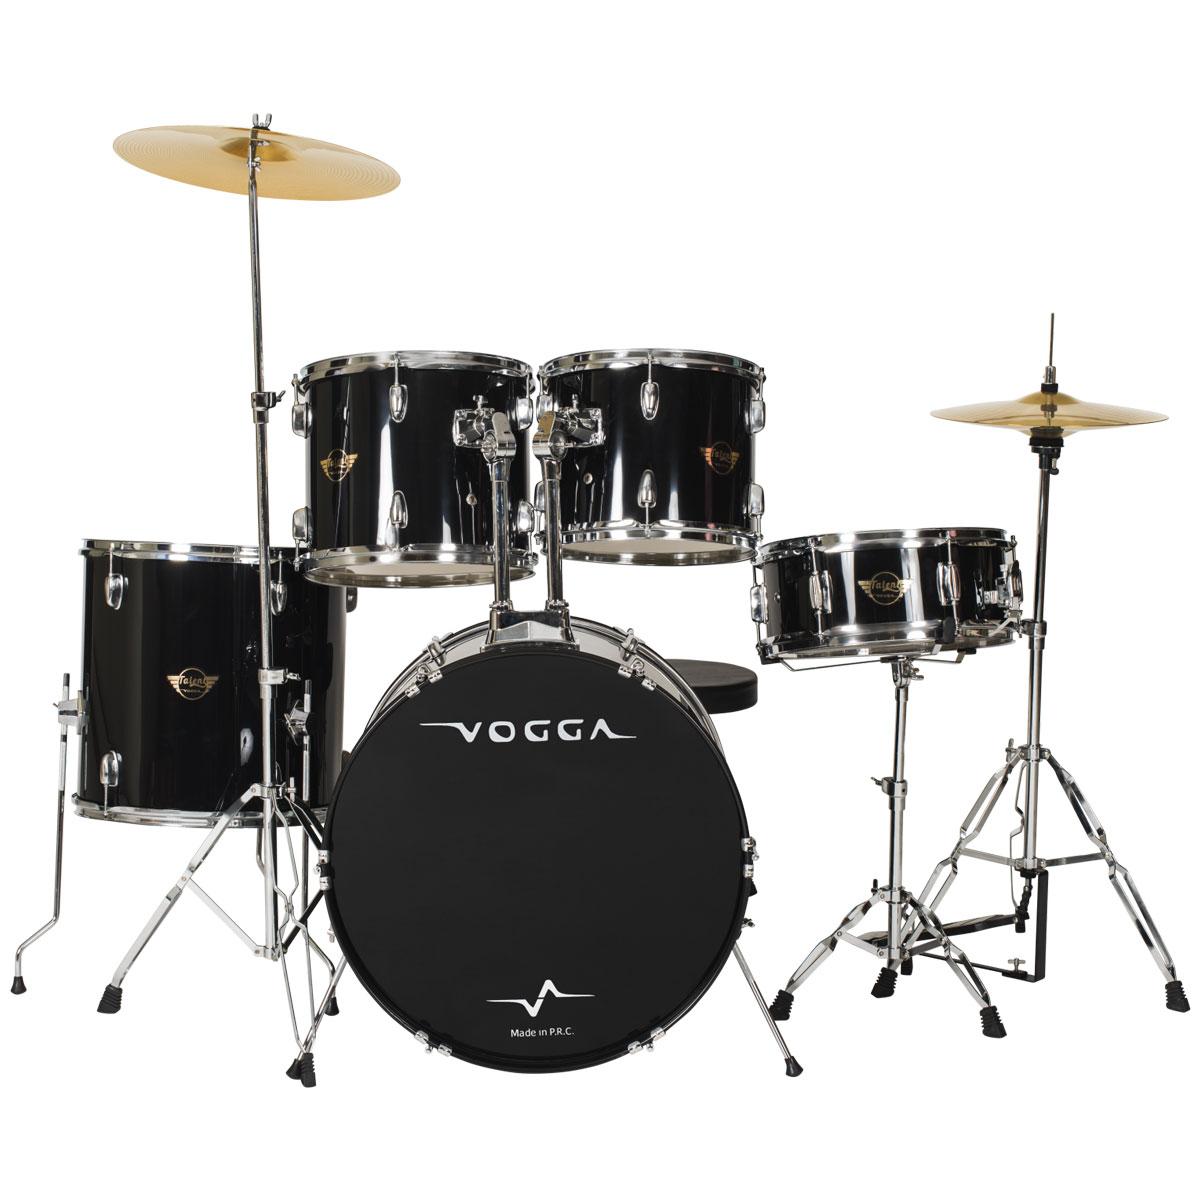 Bateria Acústica Bumbo 22 Polegadas Talent VPD924 Preta - Vogga